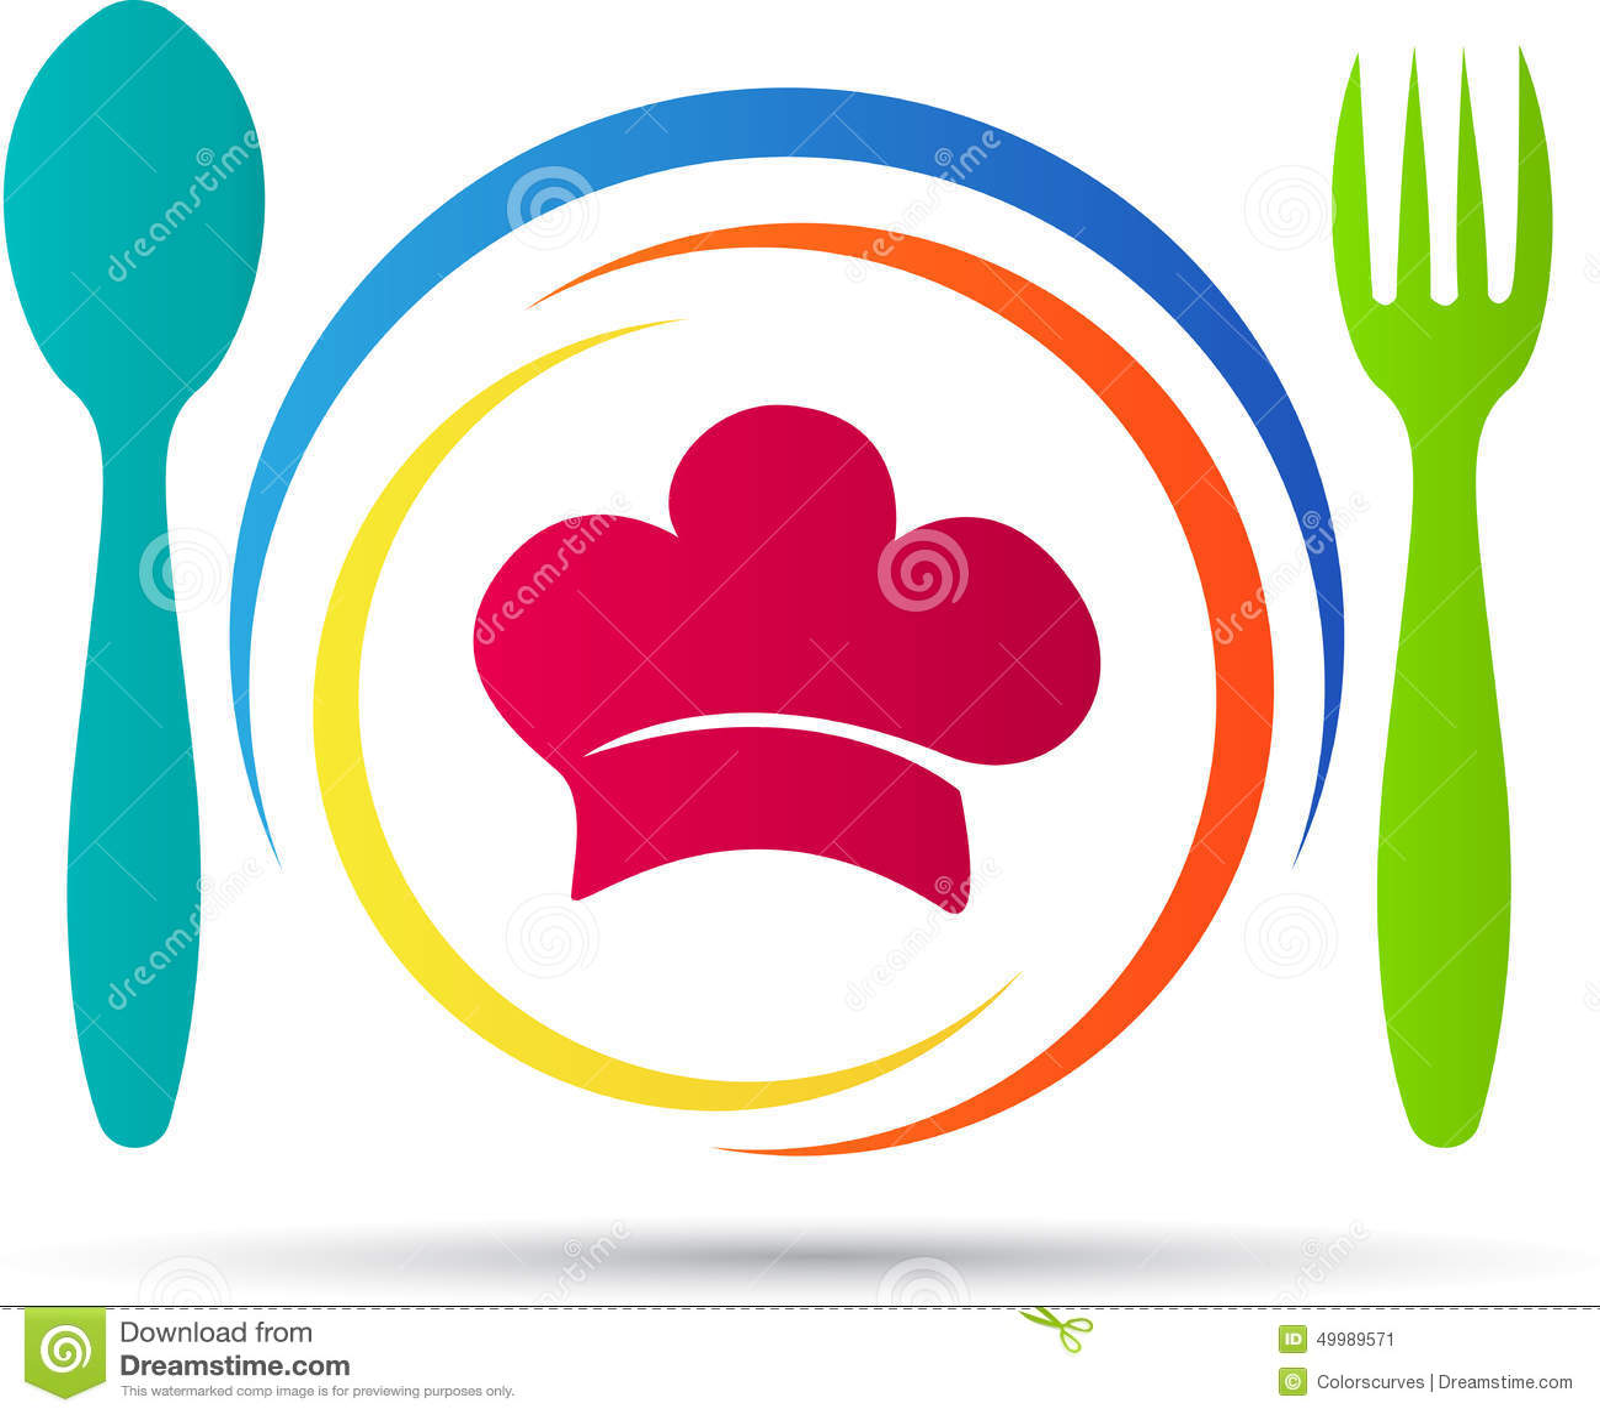 restaurant clipart download - photo #26